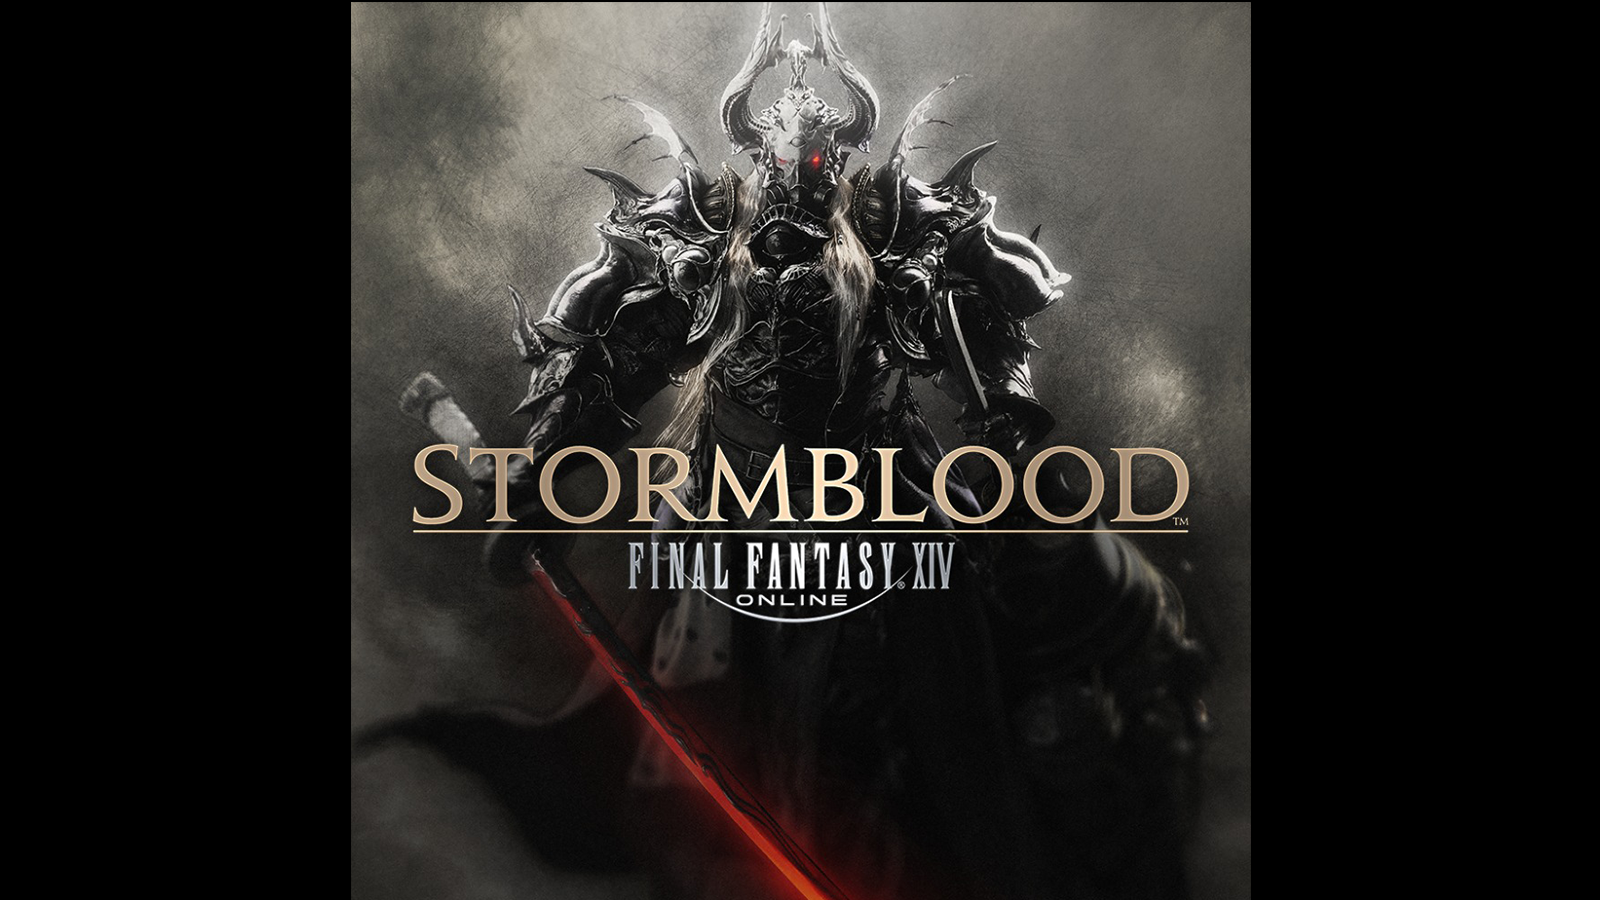 Final Fantasy Xiv Stormblood Game Ps4 Playstation